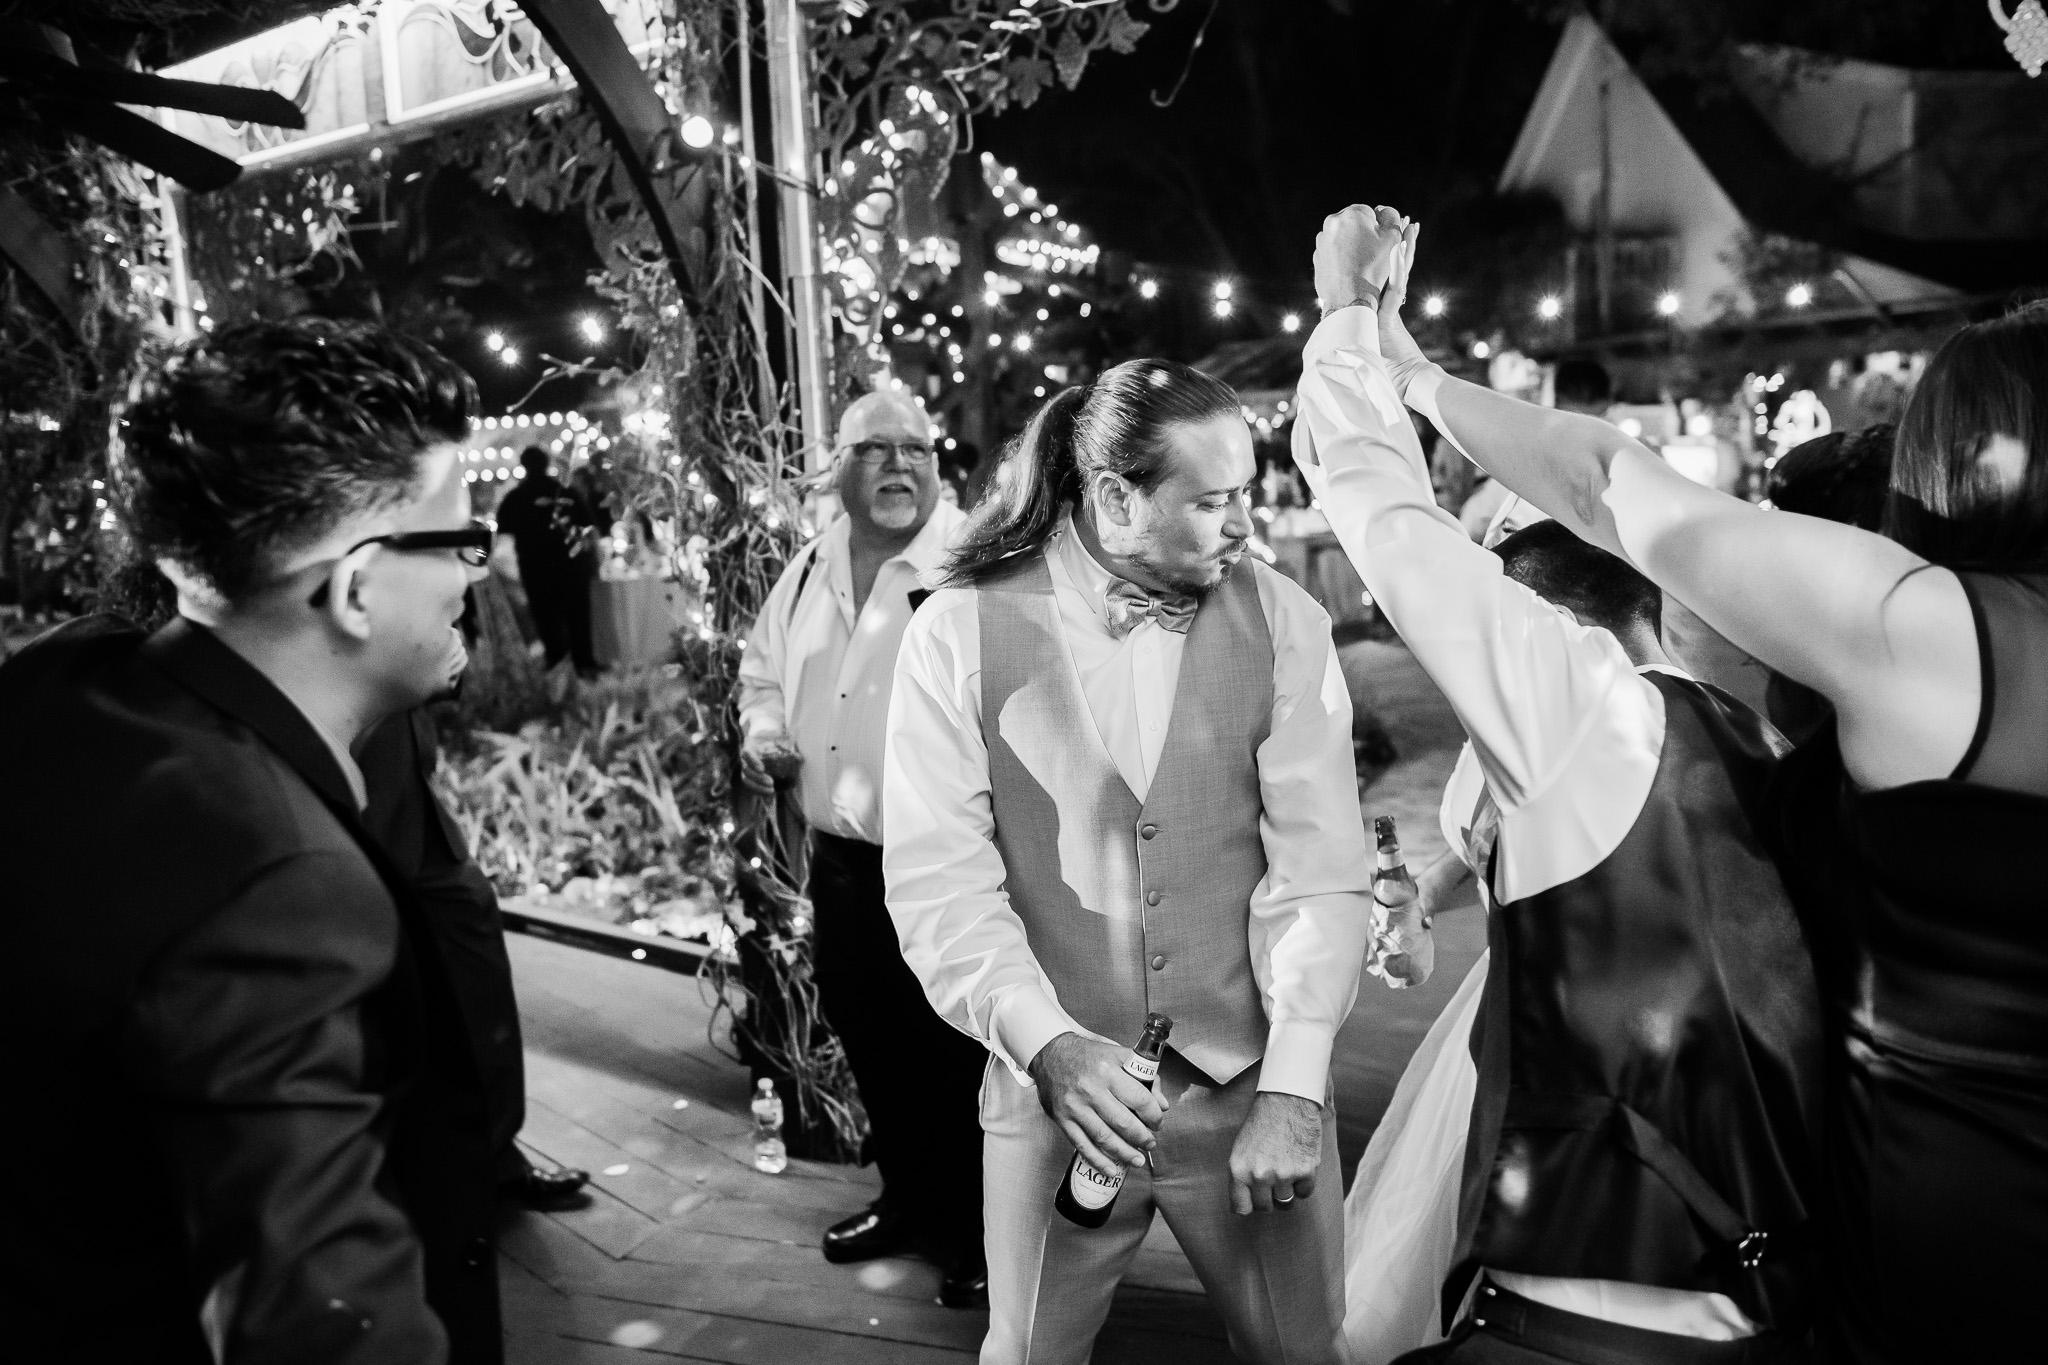 TAMPA_WEDDING_GIGIS_COUNTRY_GARDEN_CJMZ_D82_5157.jpg